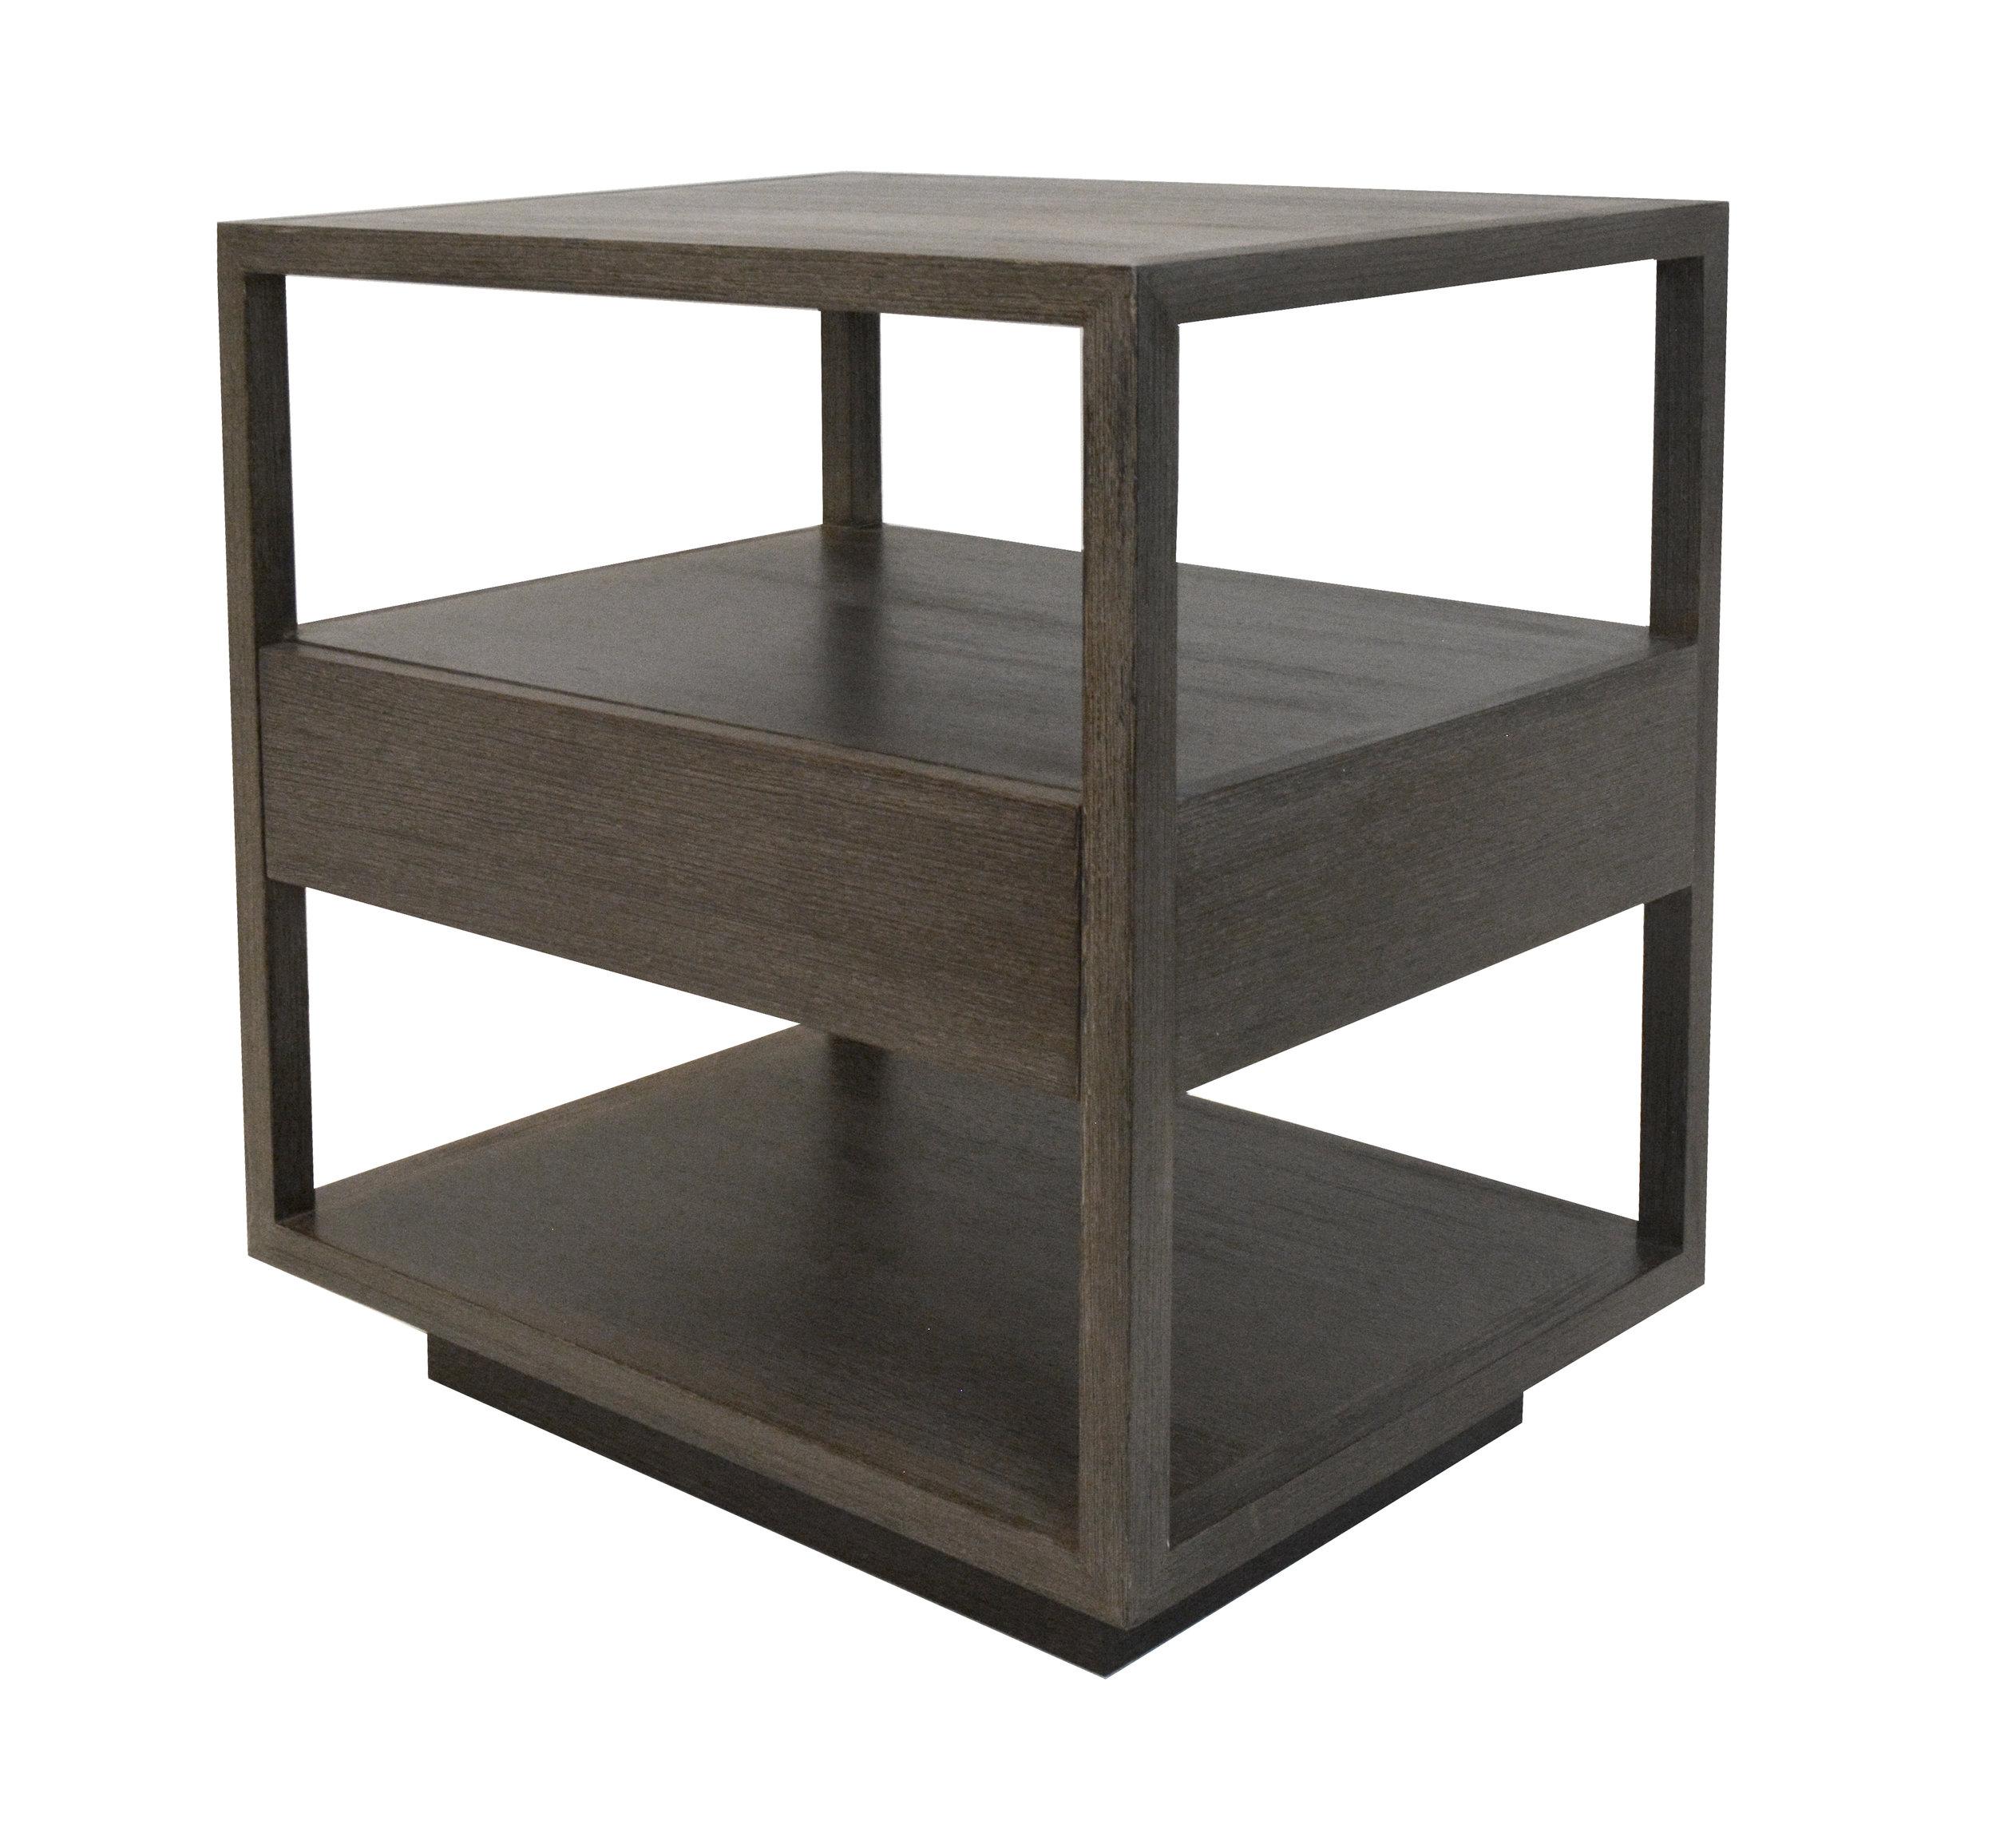 PORTER & PLUNK HOME - A bespoke furniture line created by John Gilmer